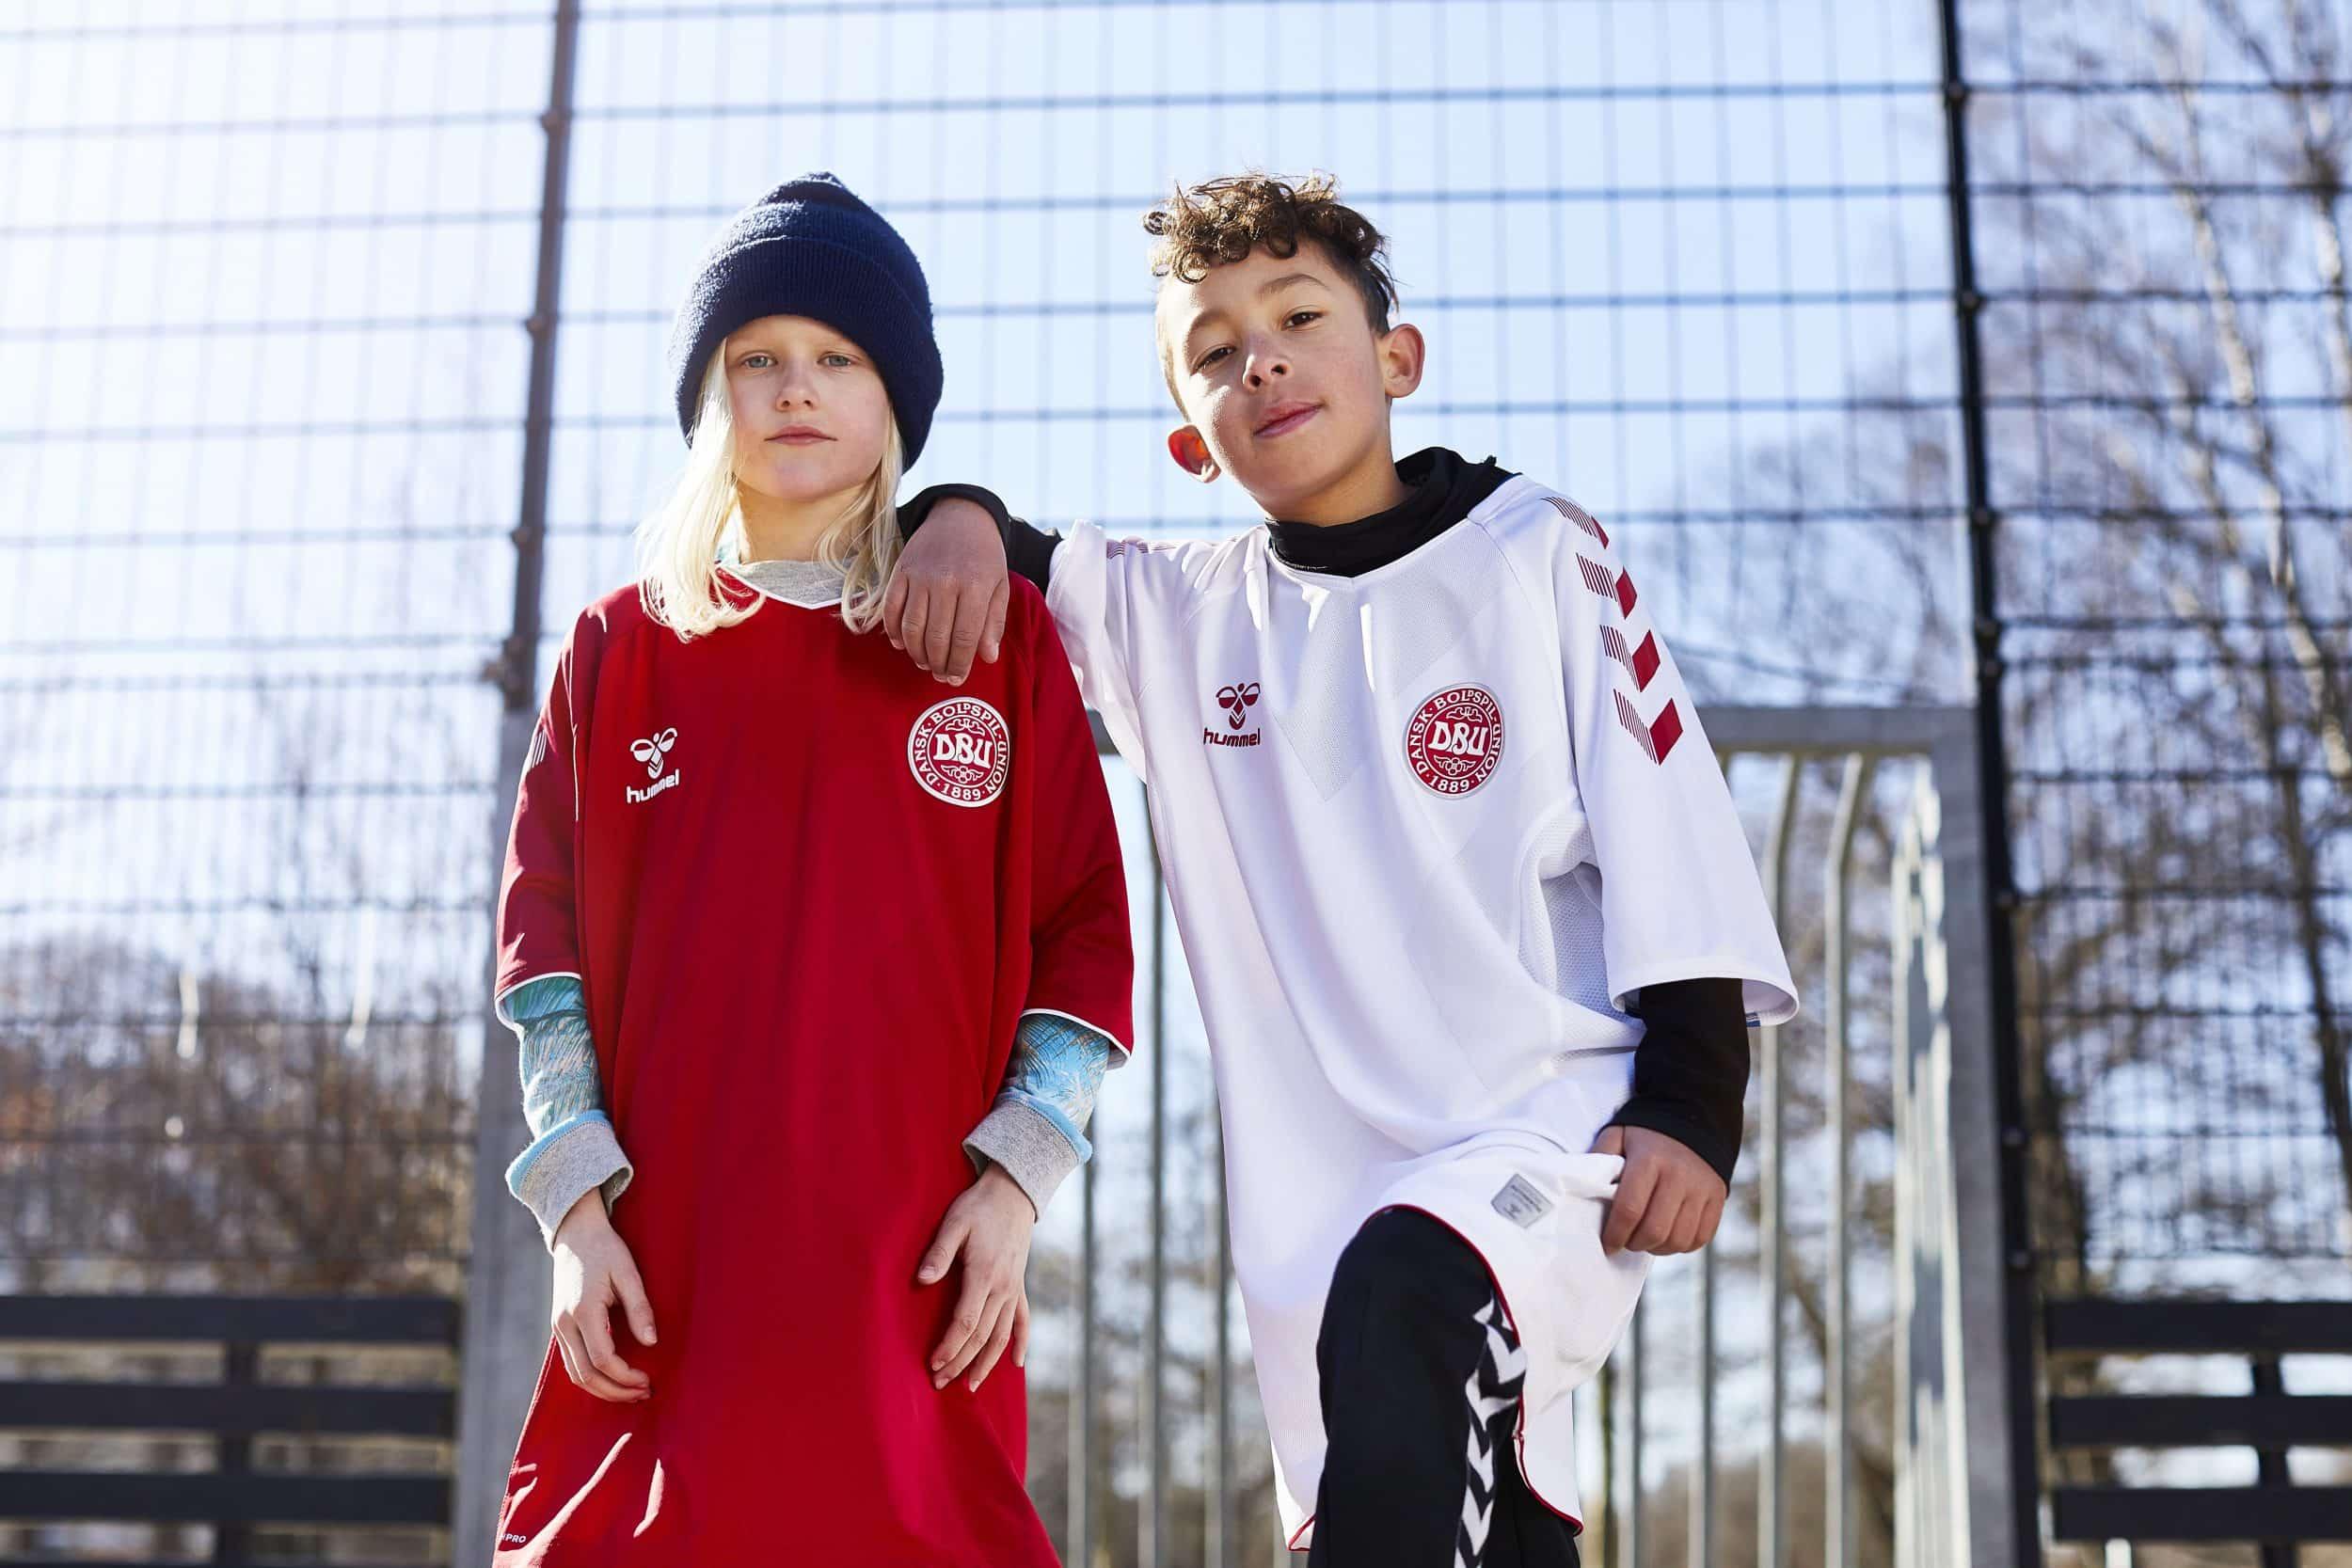 maillot-football-selection-danemark-coupe-du-monde-2018-7